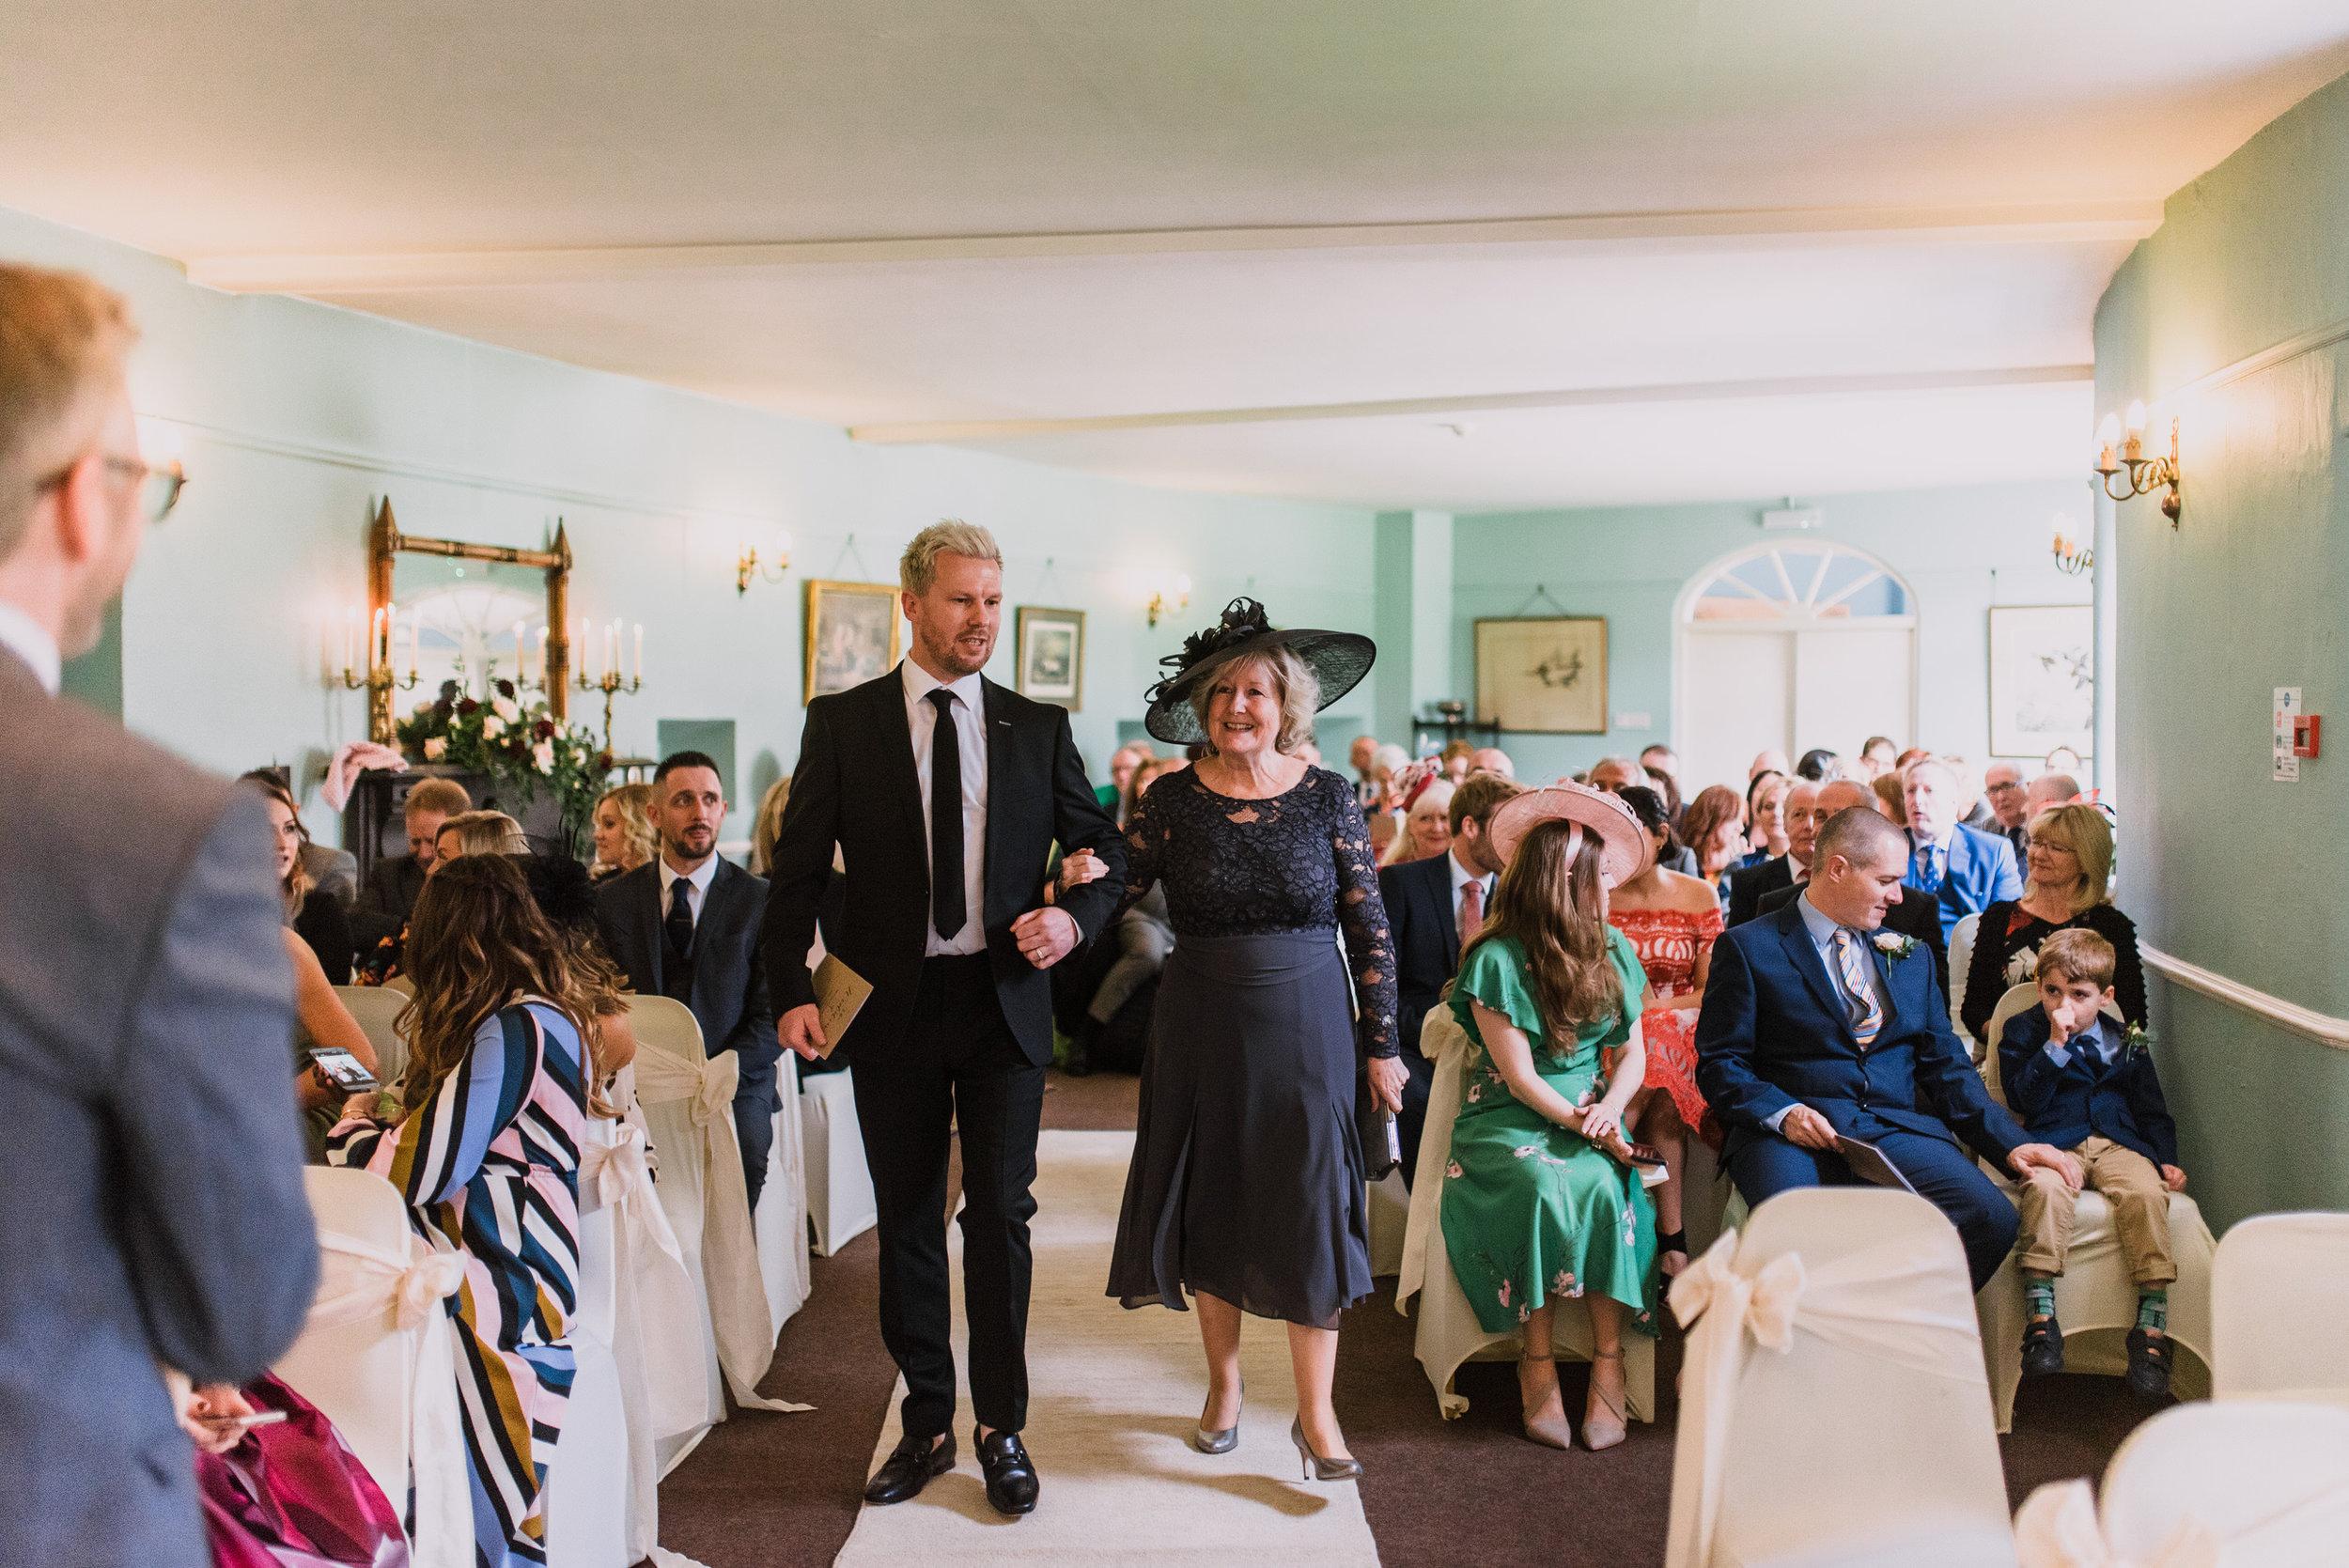 lissanoure castle wedding, northern ireland wedding photographer, romantic northern irish wedding venue, castle wedding ireland, natural wedding photography ni (42).jpg